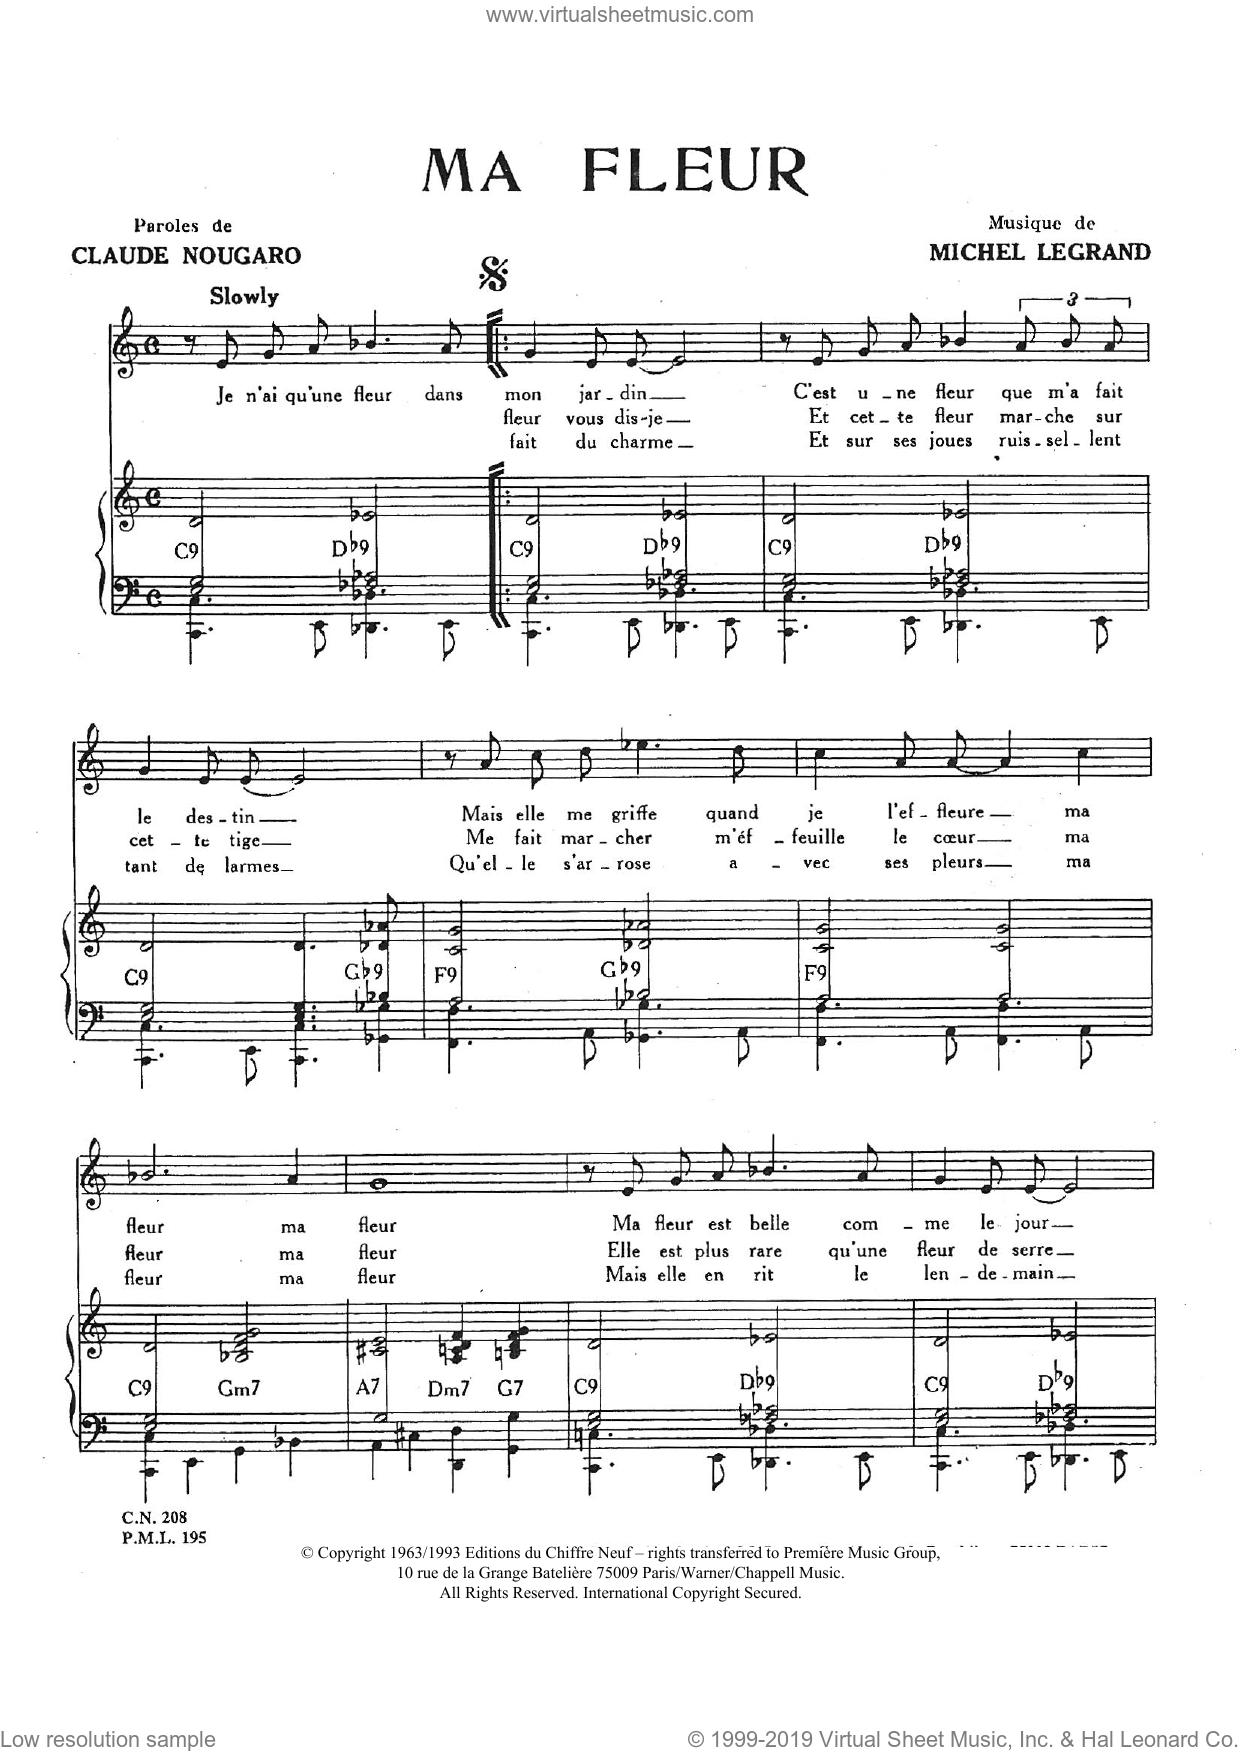 Ma Fleur sheet music for voice and piano by Claude Nougaro and Michel LeGrand, intermediate skill level